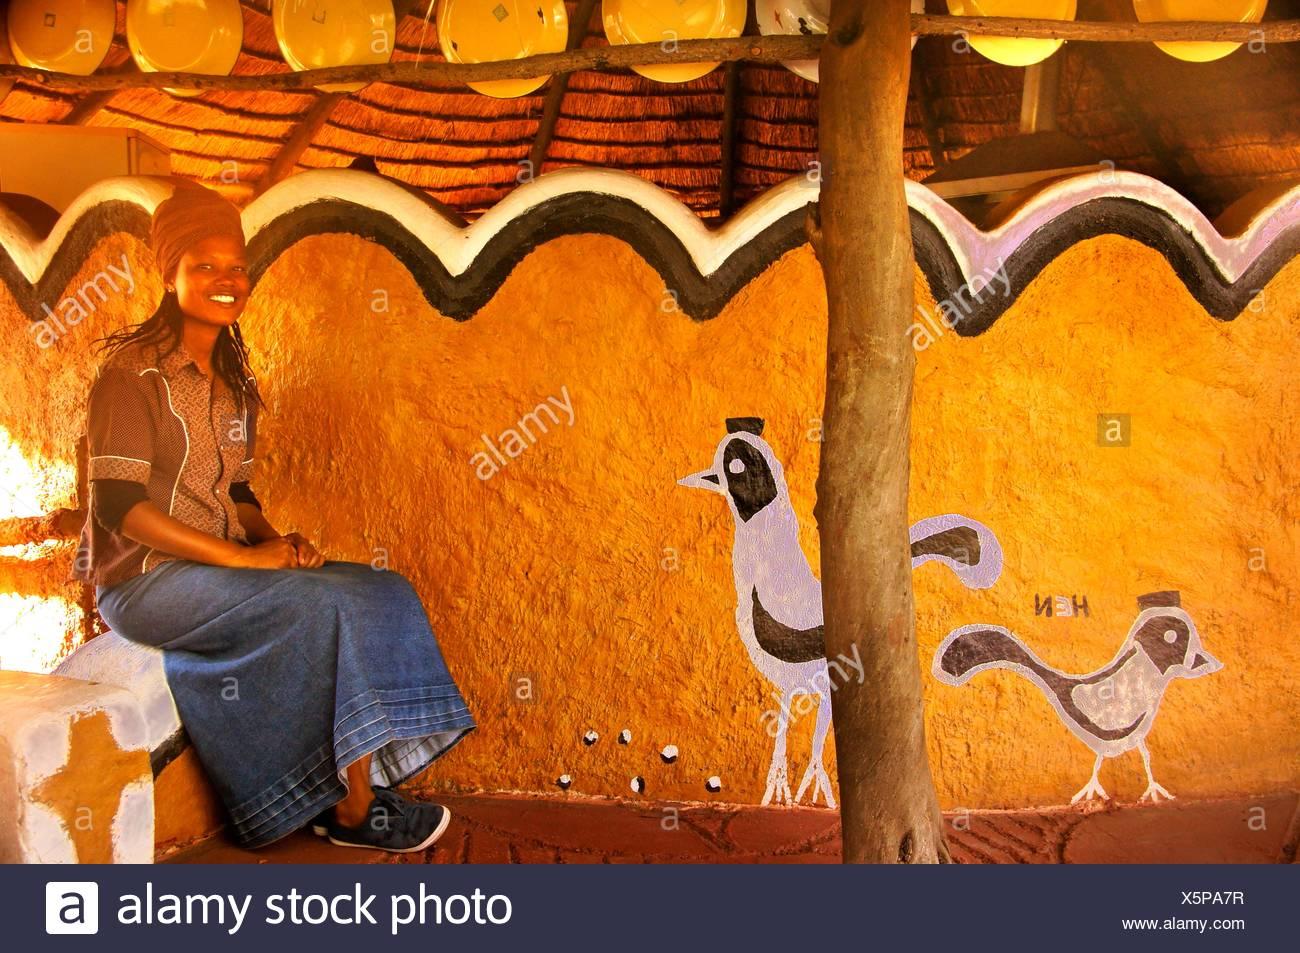 Jeune femme au 'Planet' Baobab à Gweta, Botswana Photo Stock